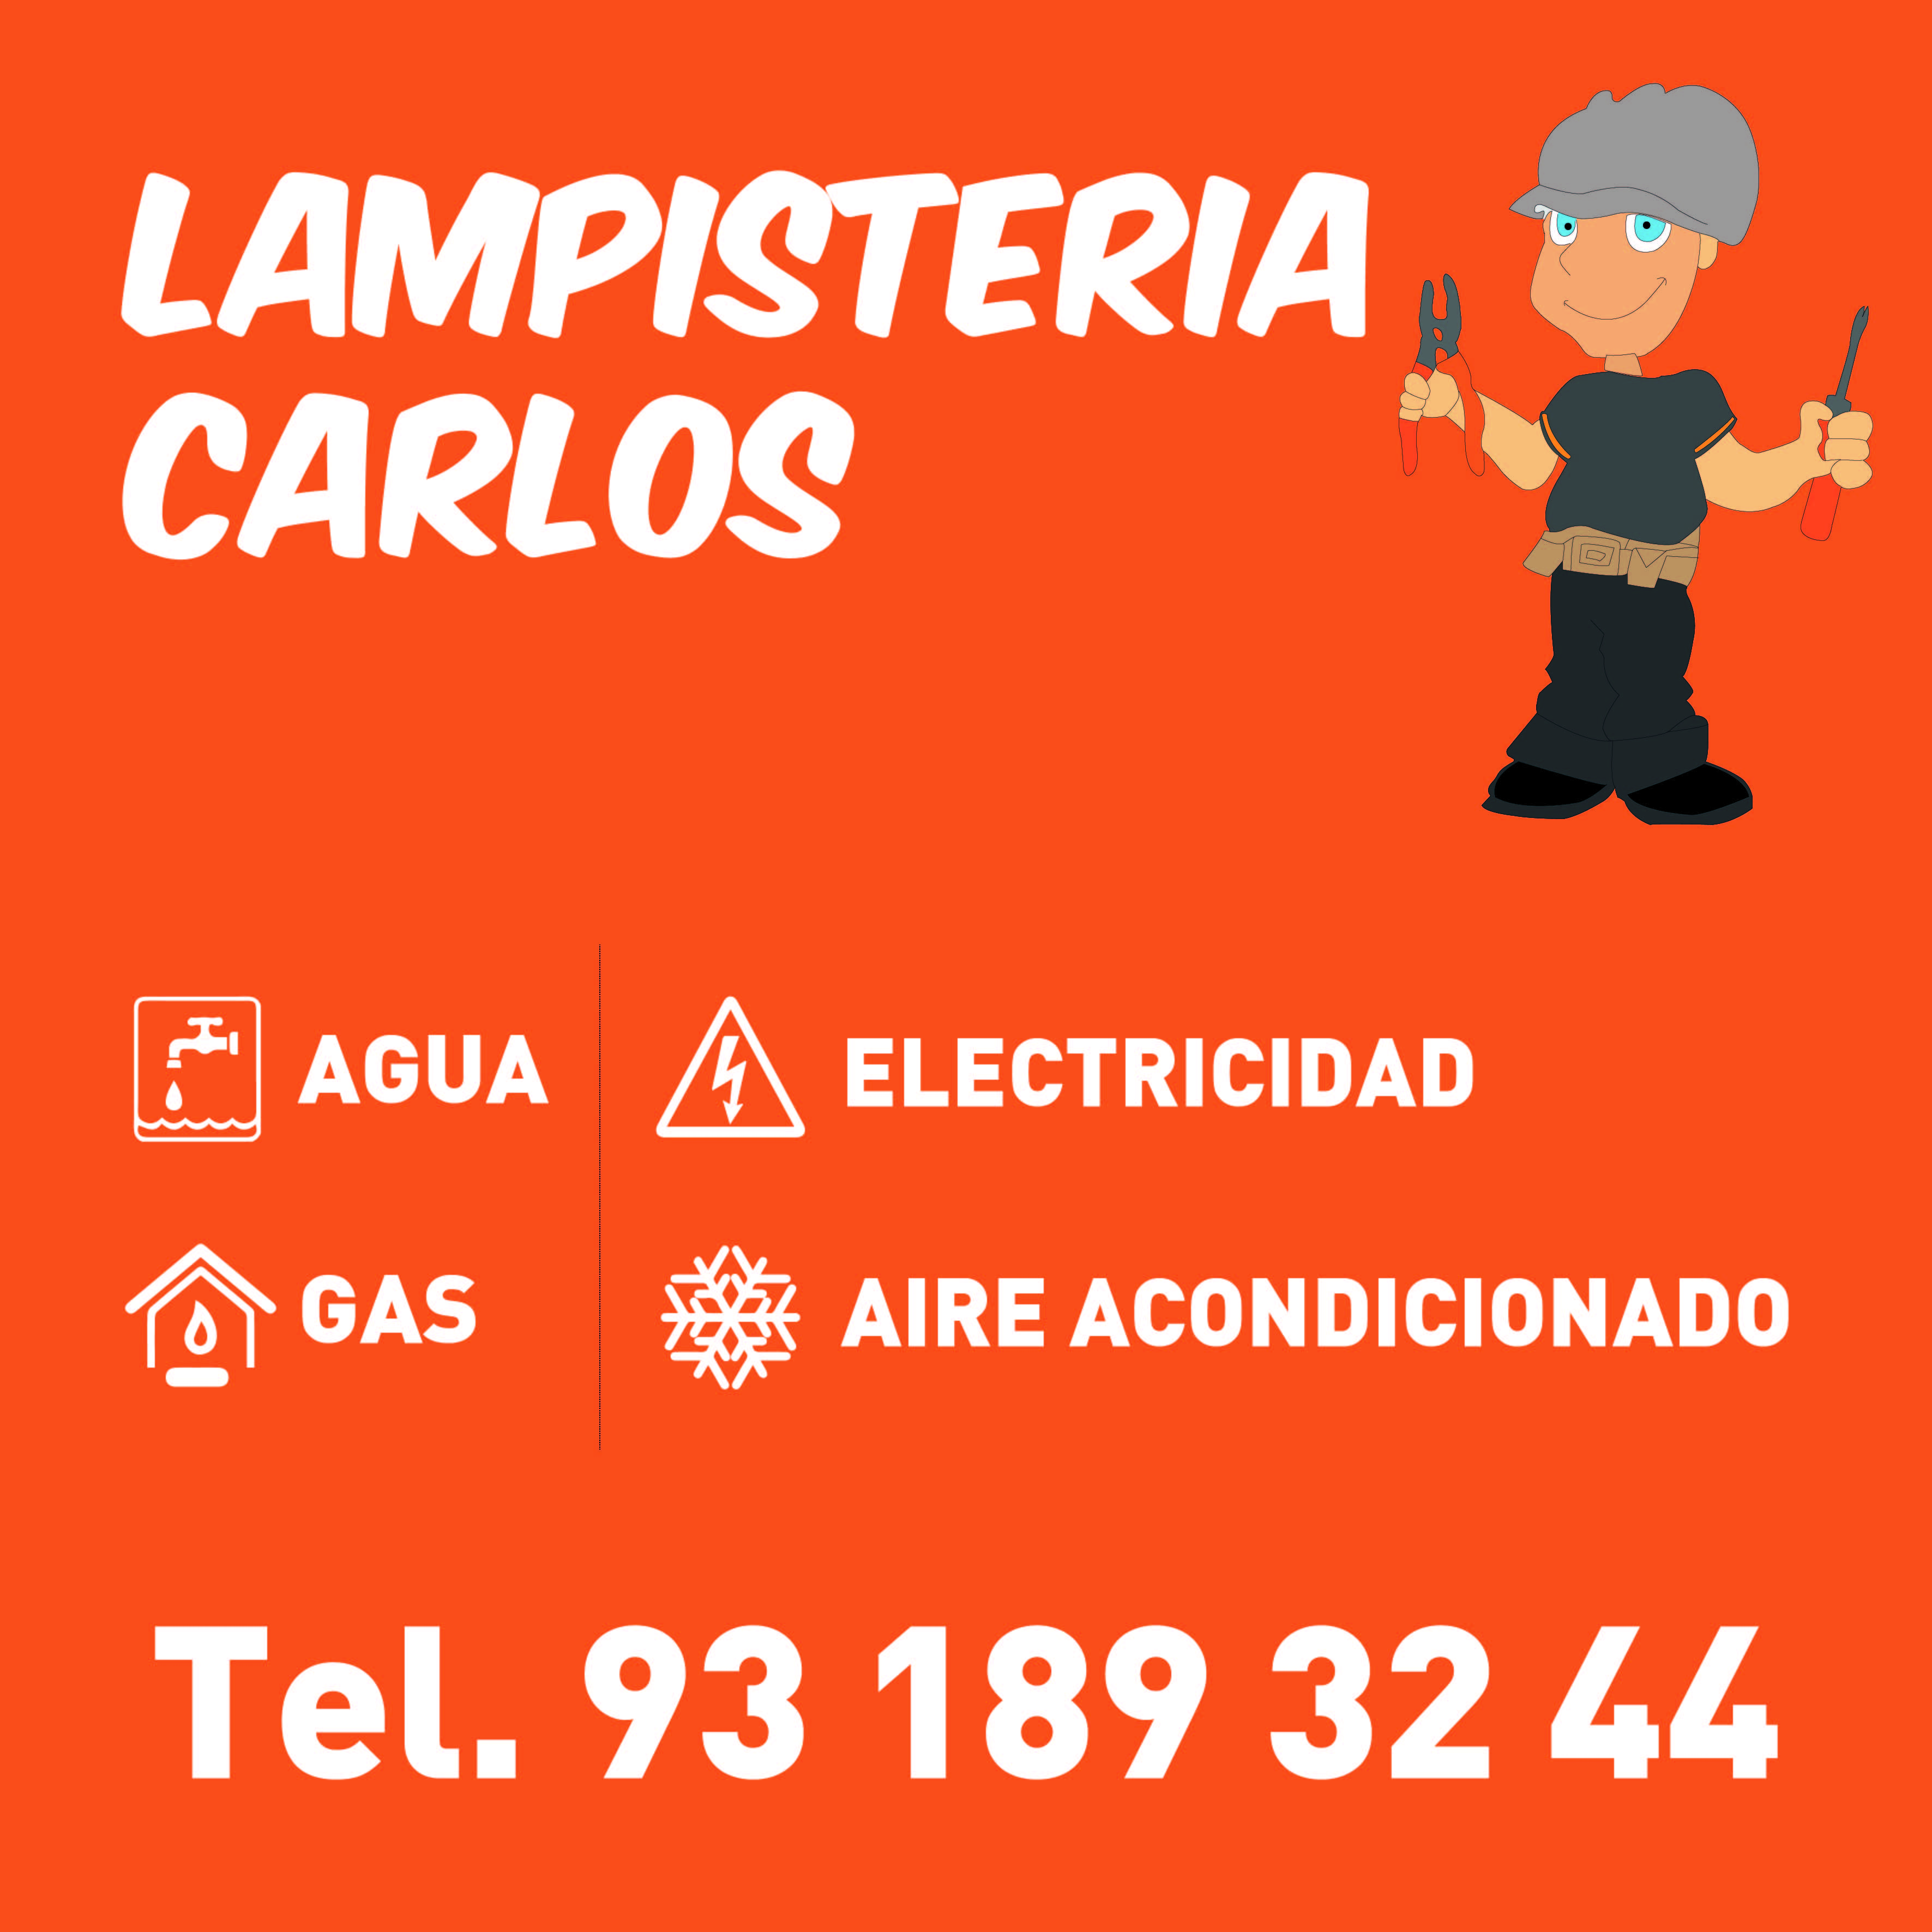 Lampisteria Carlos